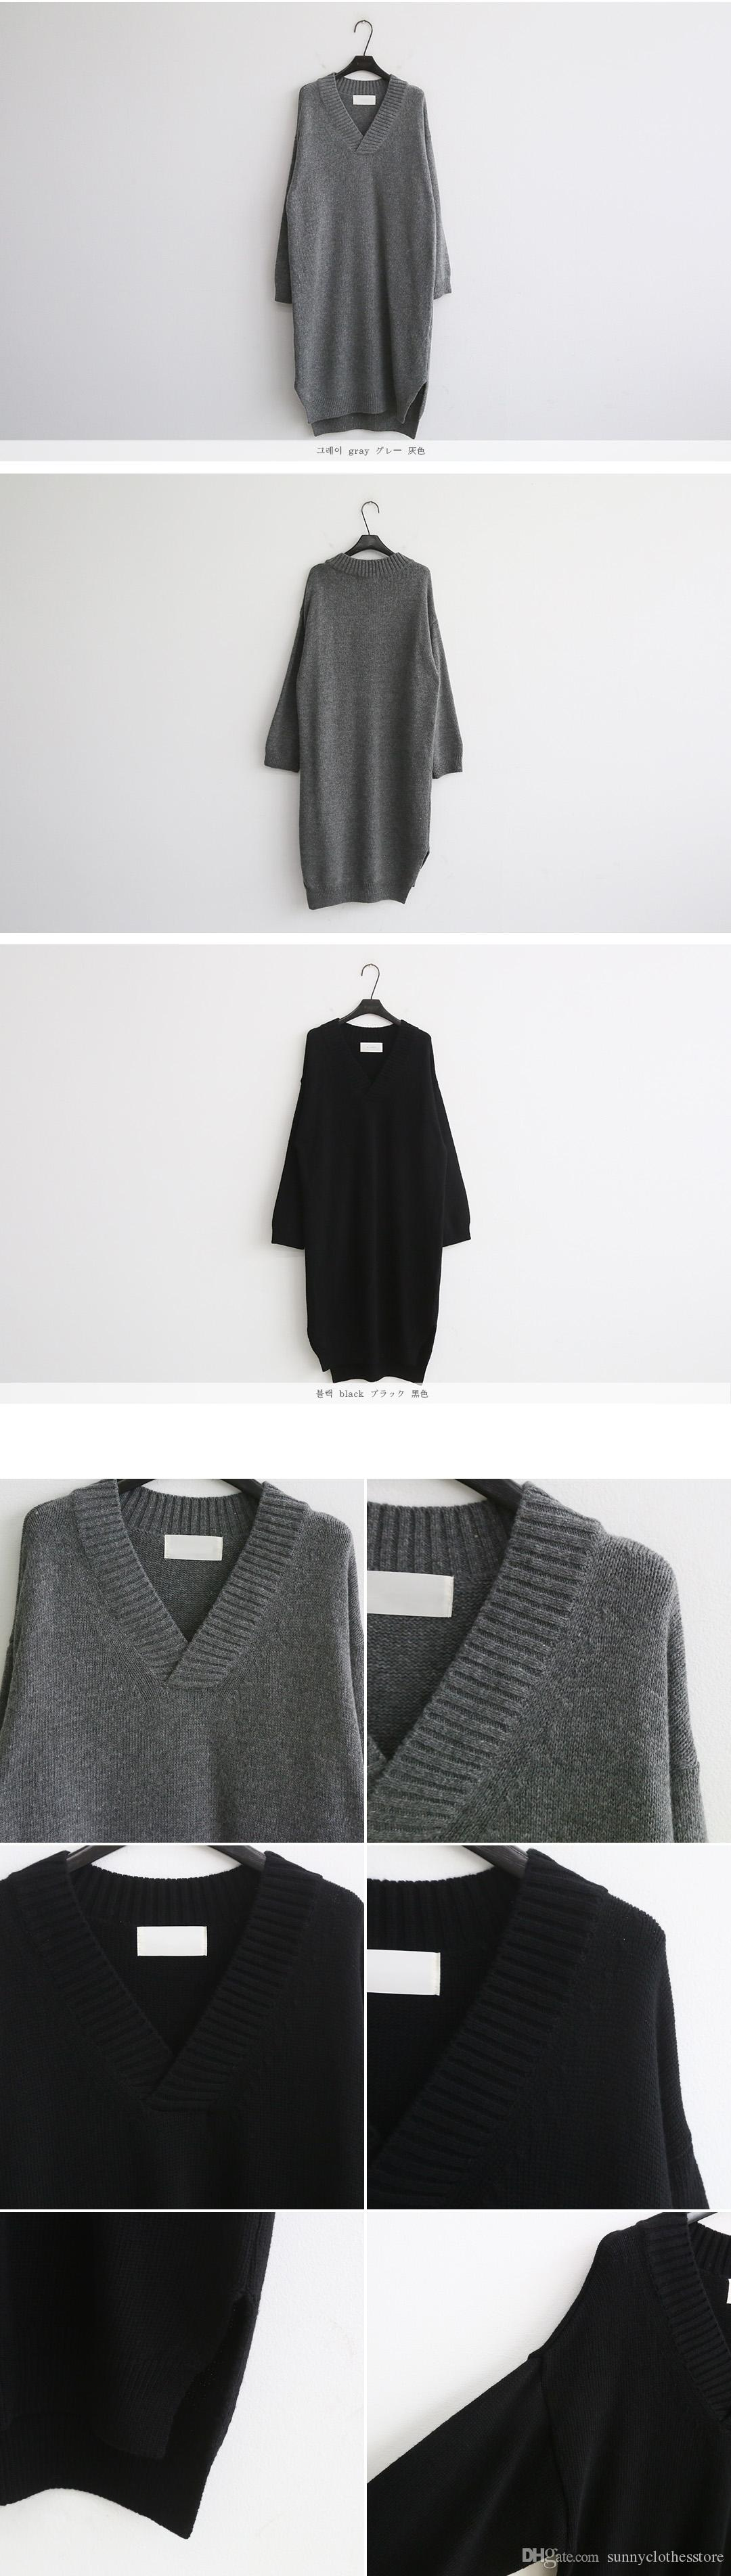 Autumn and winter new Korean version of the Joker sweater skirt V-neck thickened long-sleeved loose sweater women